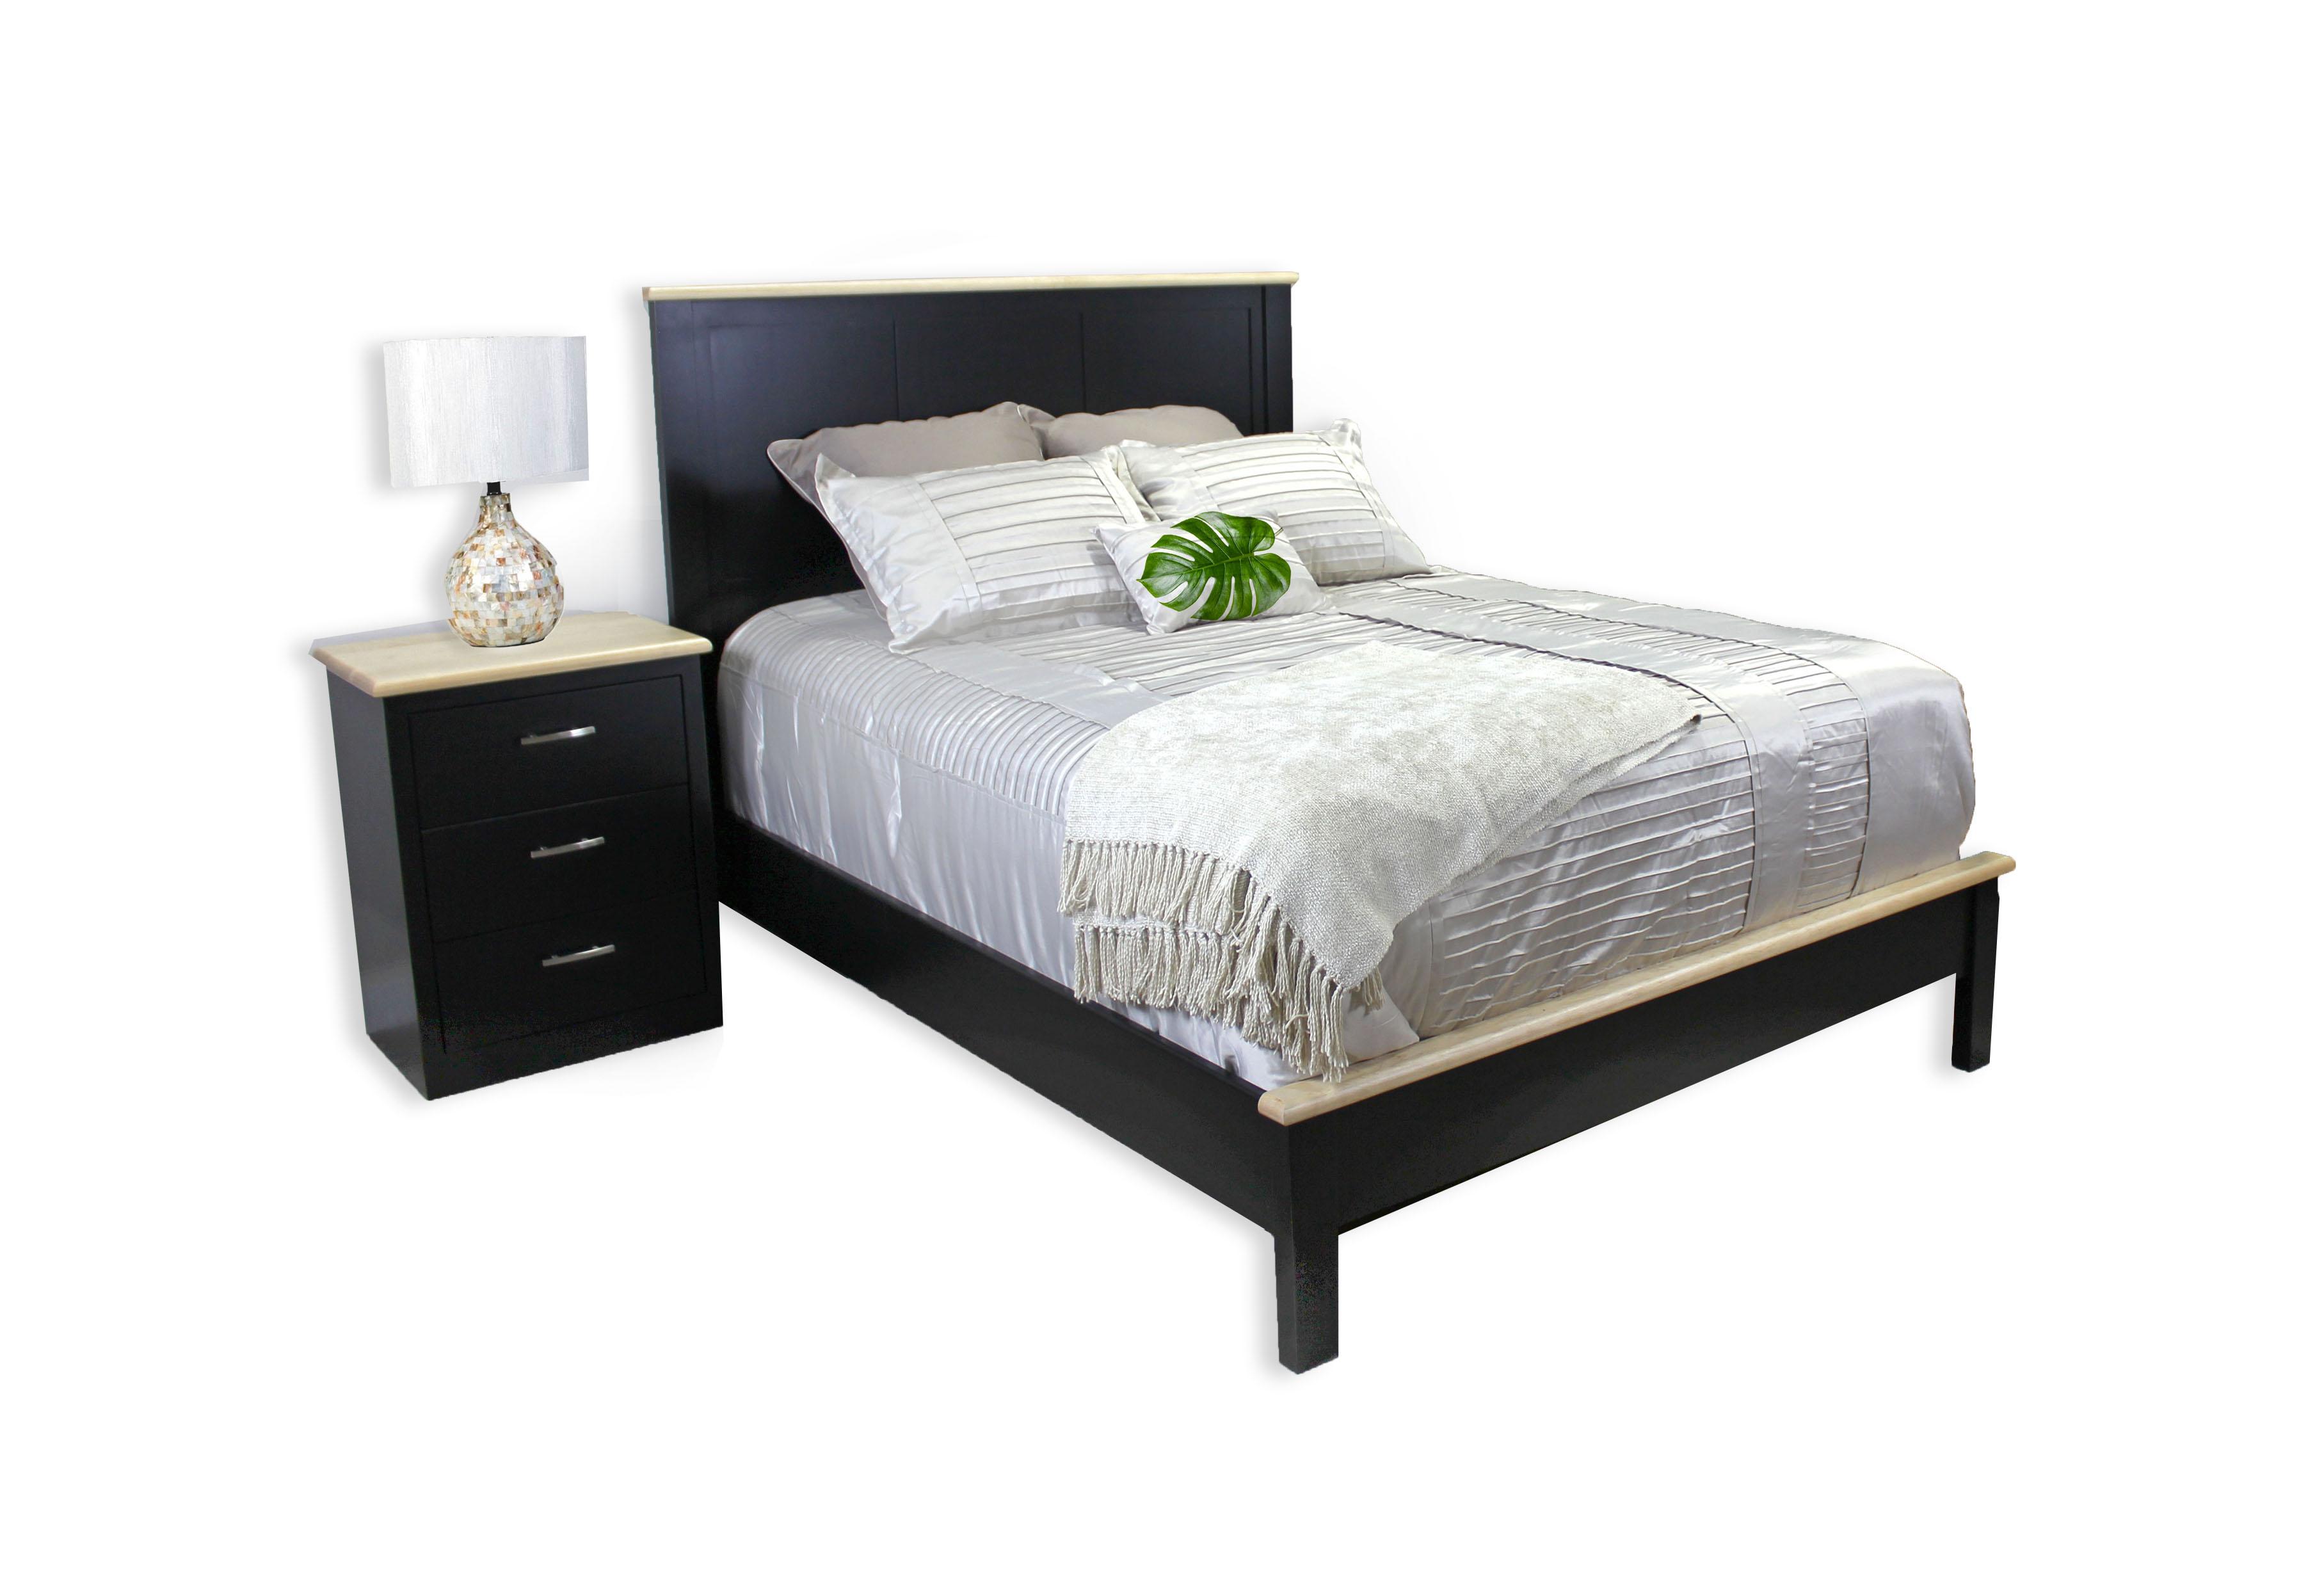 Urban Queen Rail Bed in Maple